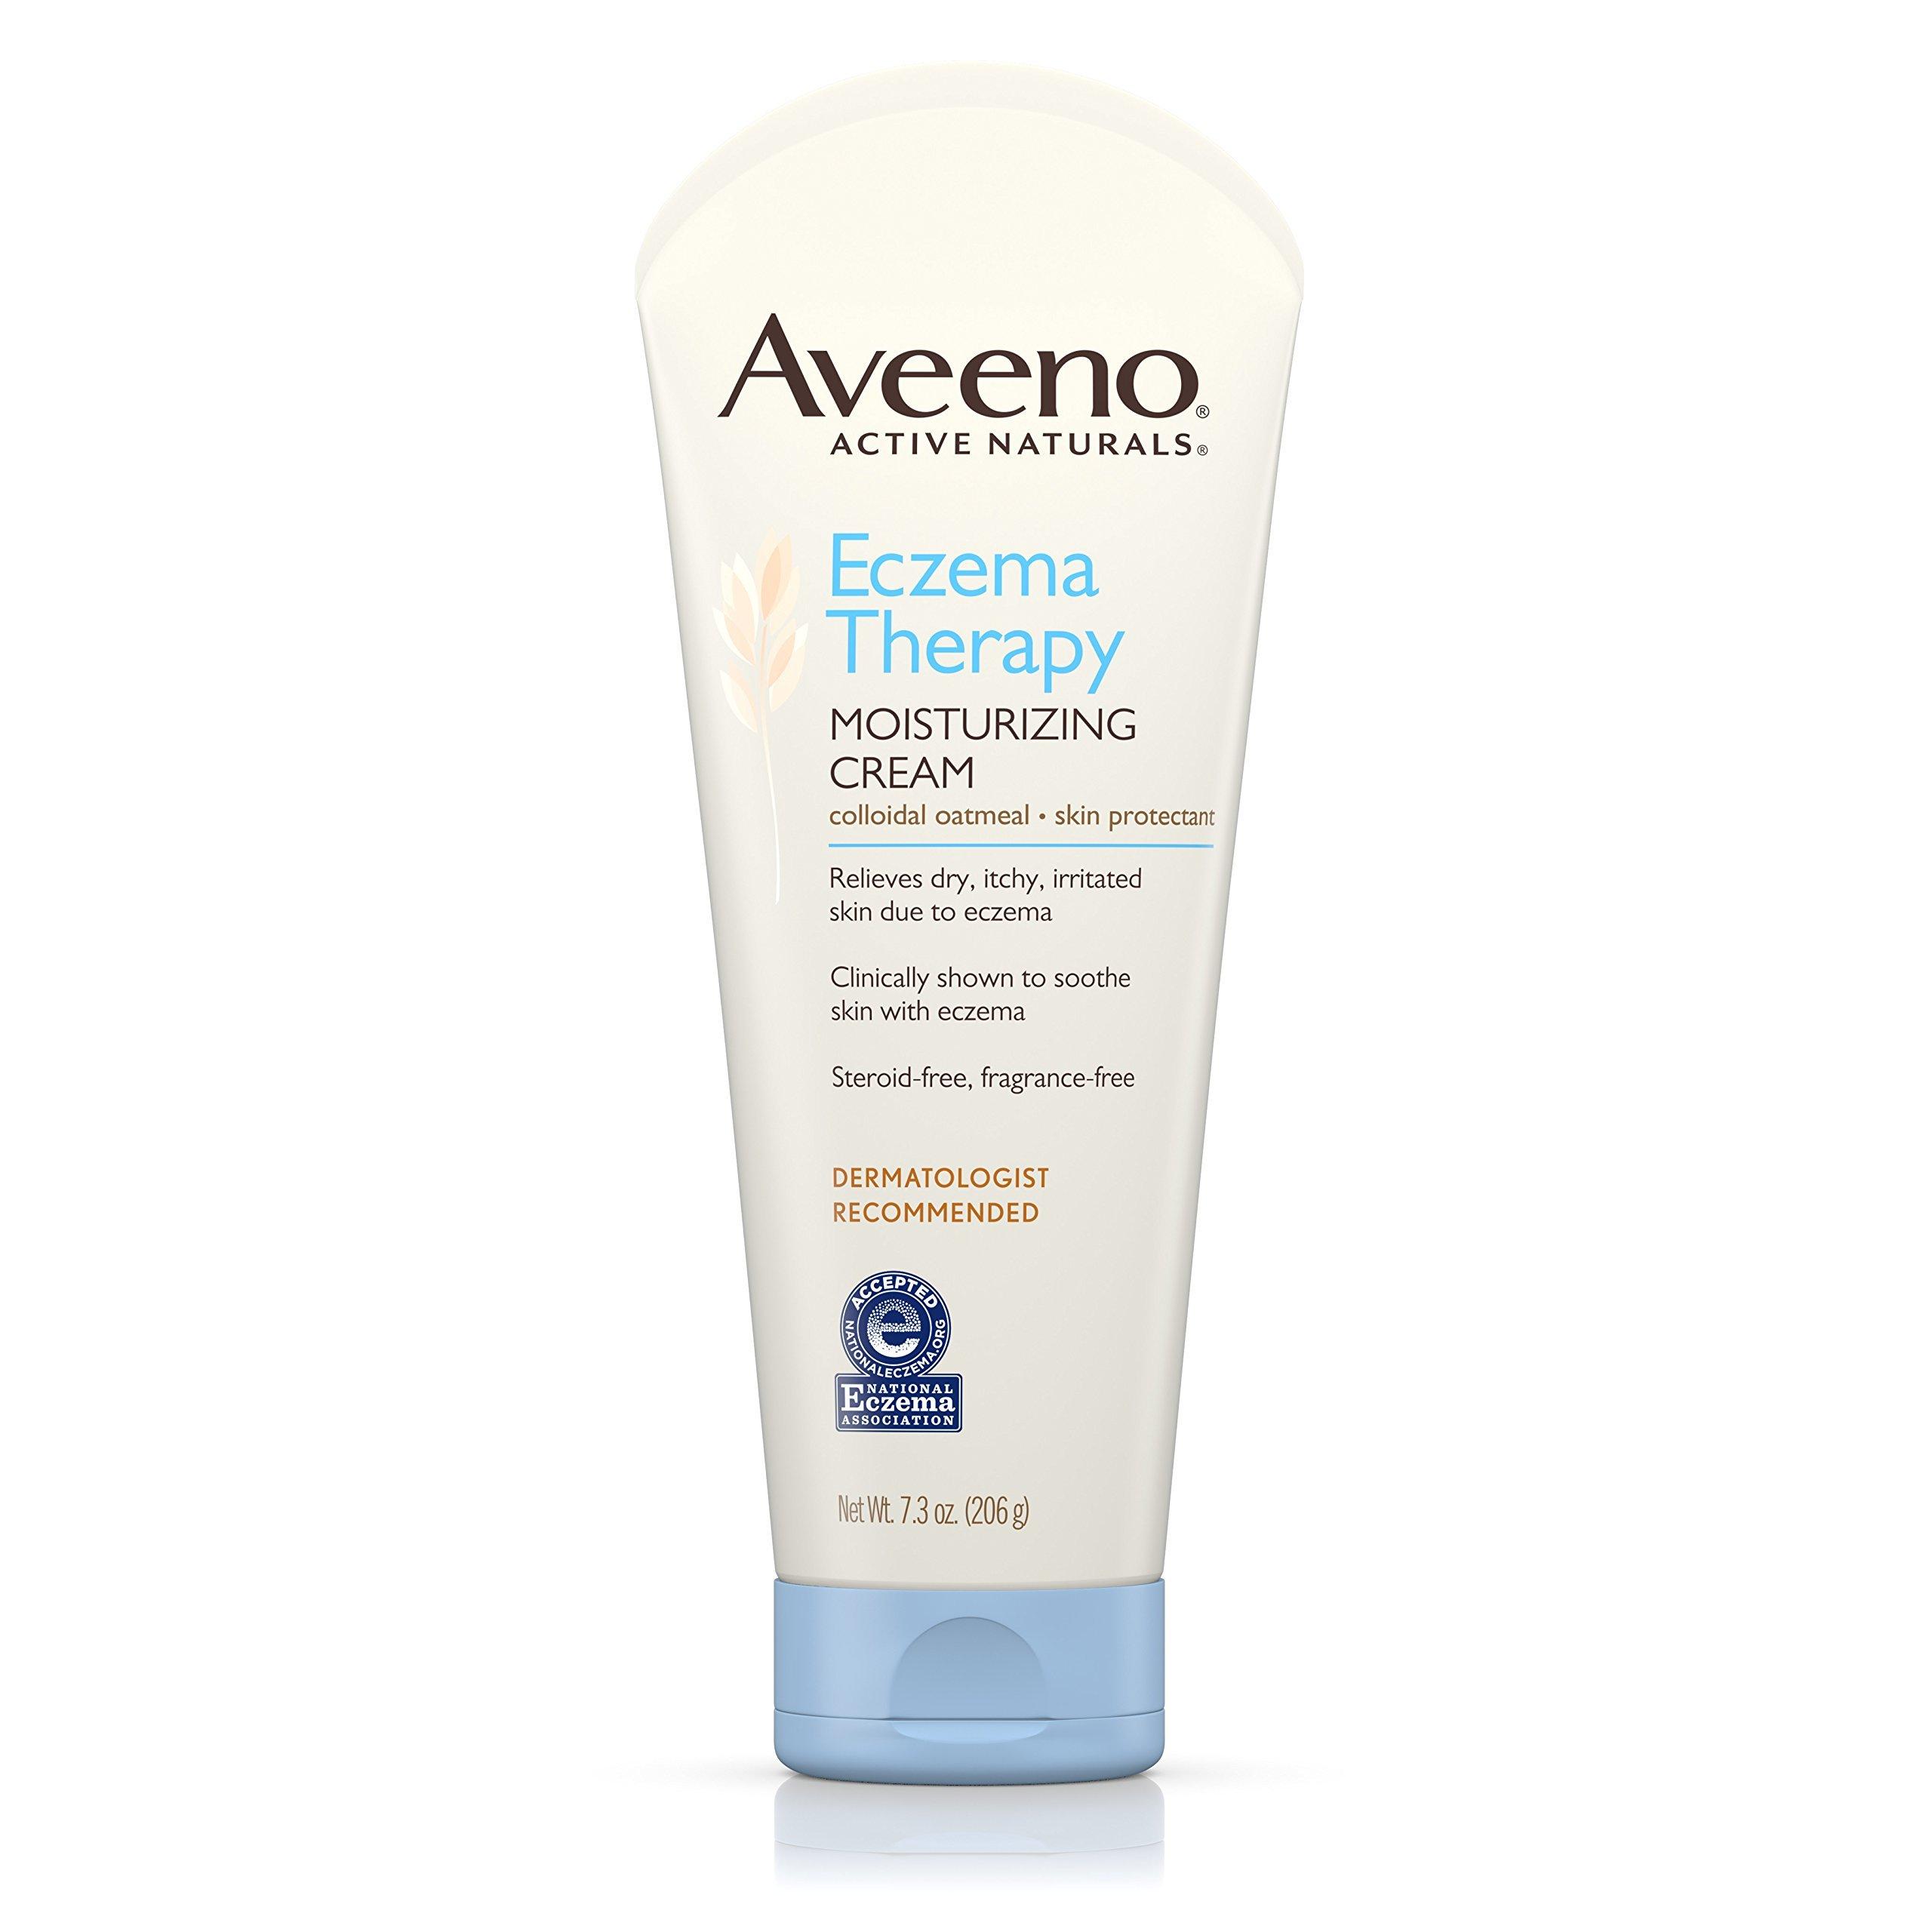 Aveeno Eczema Therapy Moisturizing Cream For Sensitive Skin, 7.3 Oz